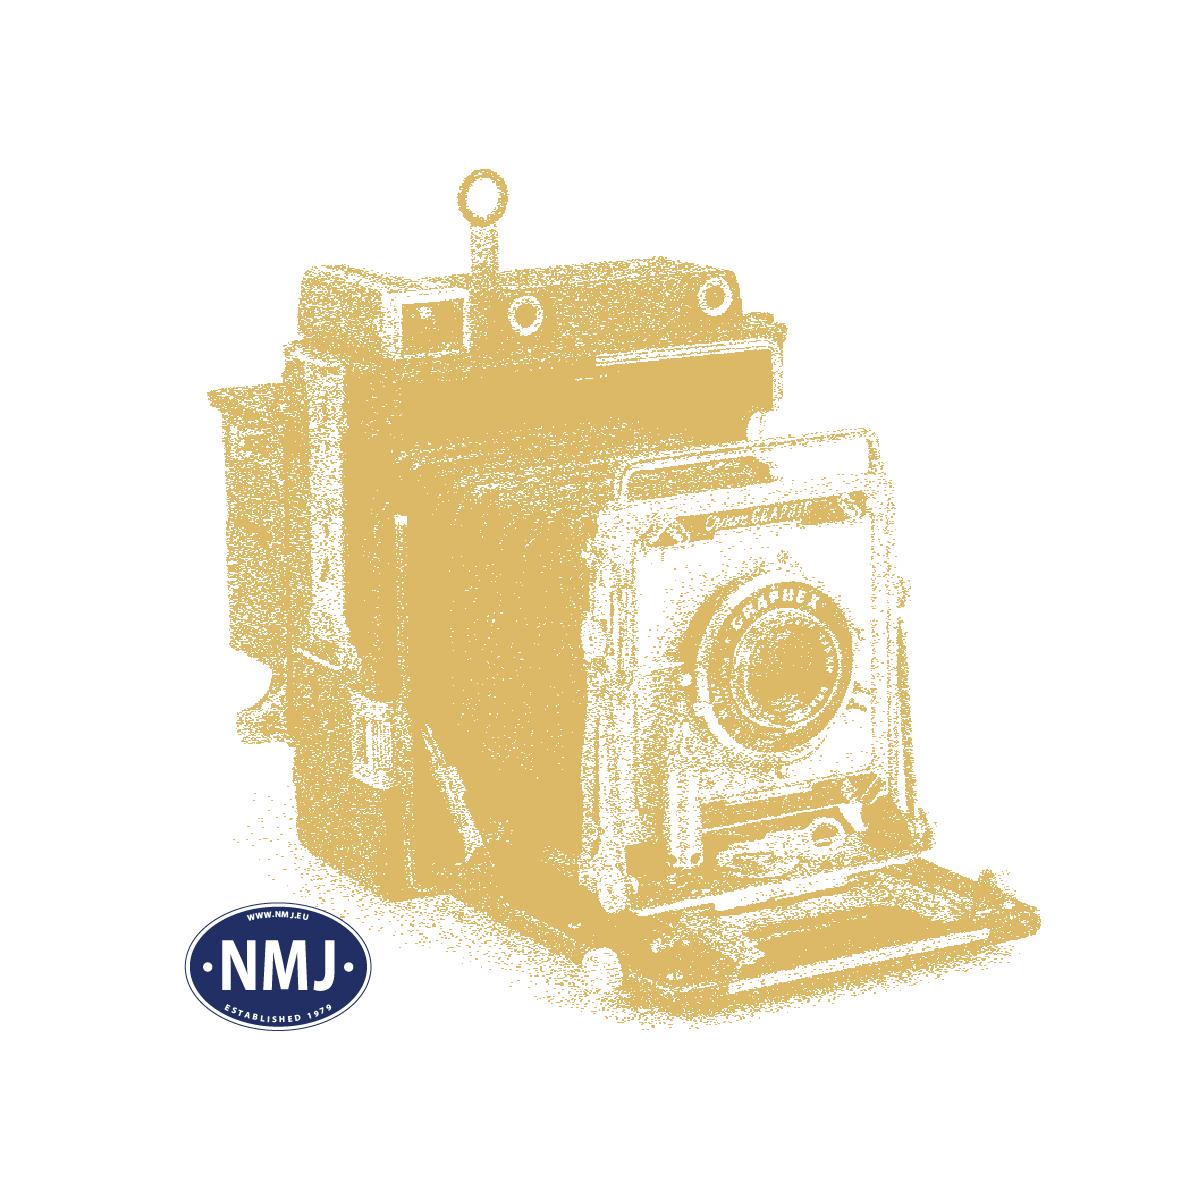 NMJT90402 - NMJ Topline SNCB 202003, DCC Sound